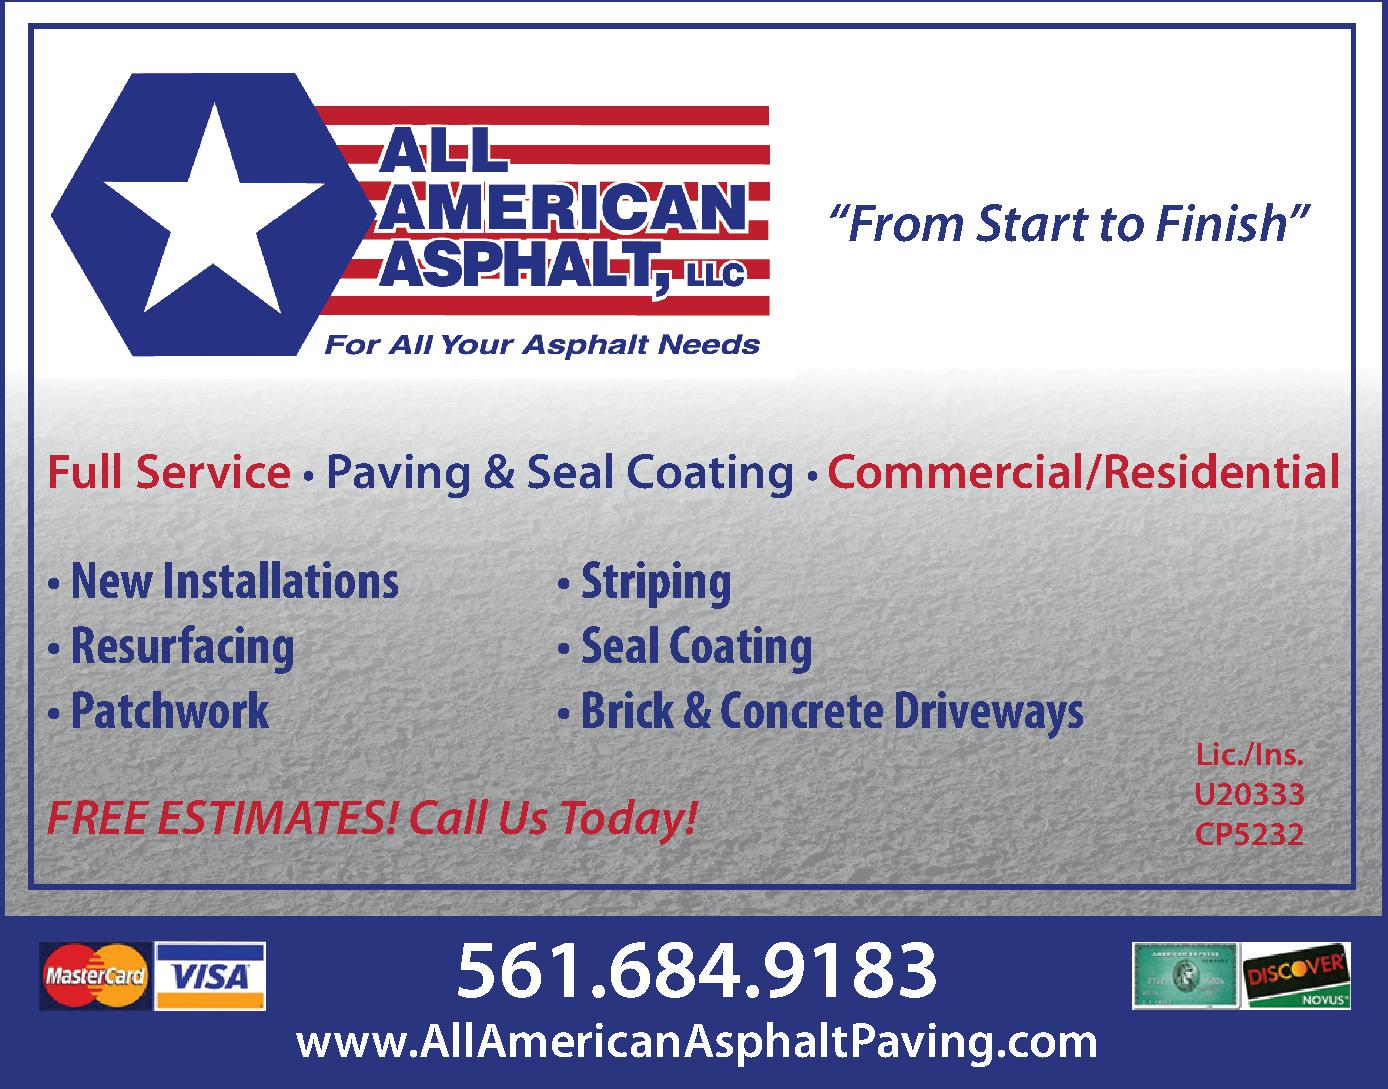 All American Asphalt, LLC